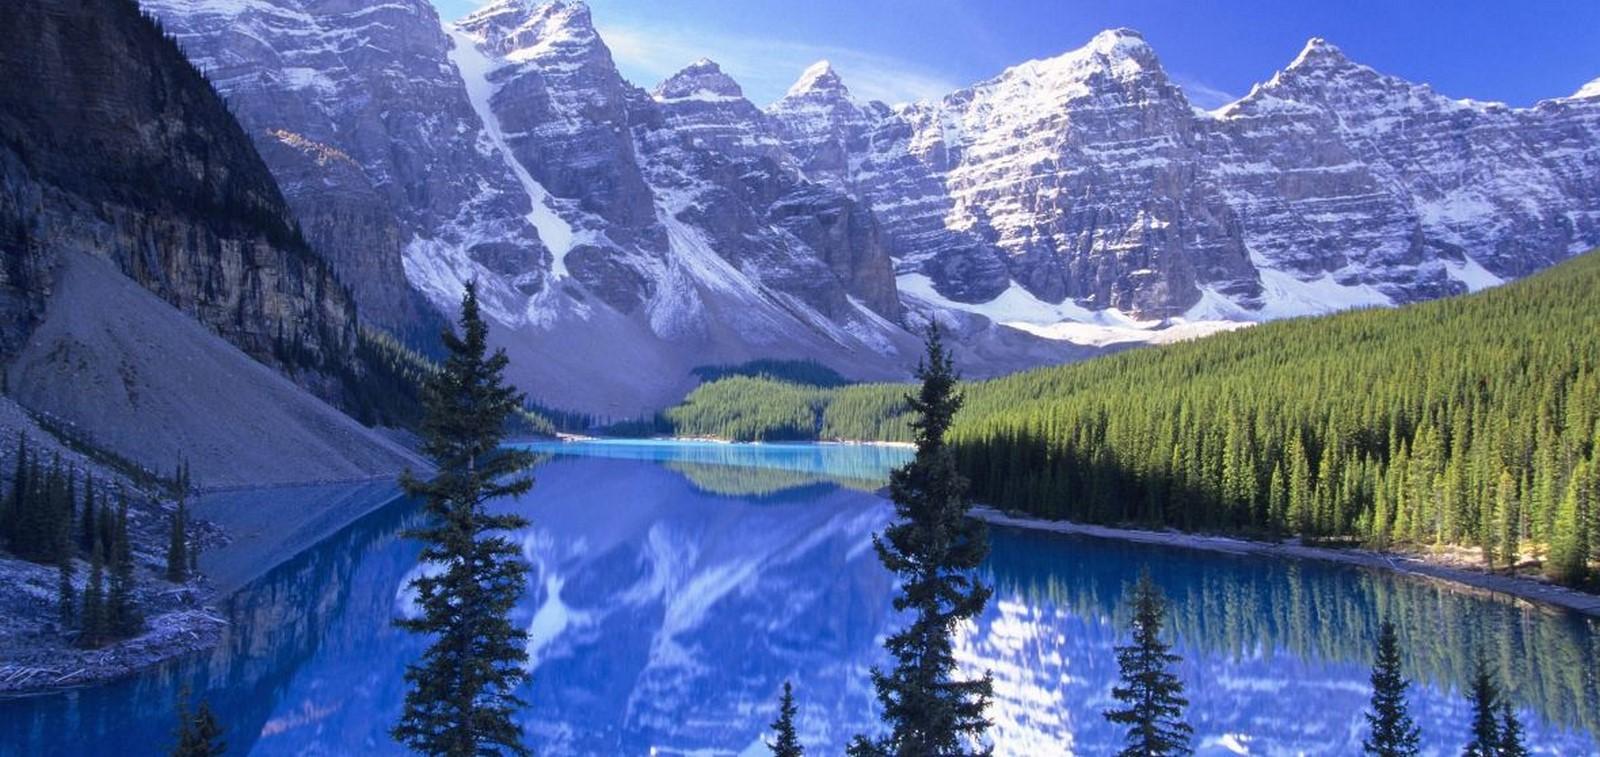 Day trip to Banff - Sheet1